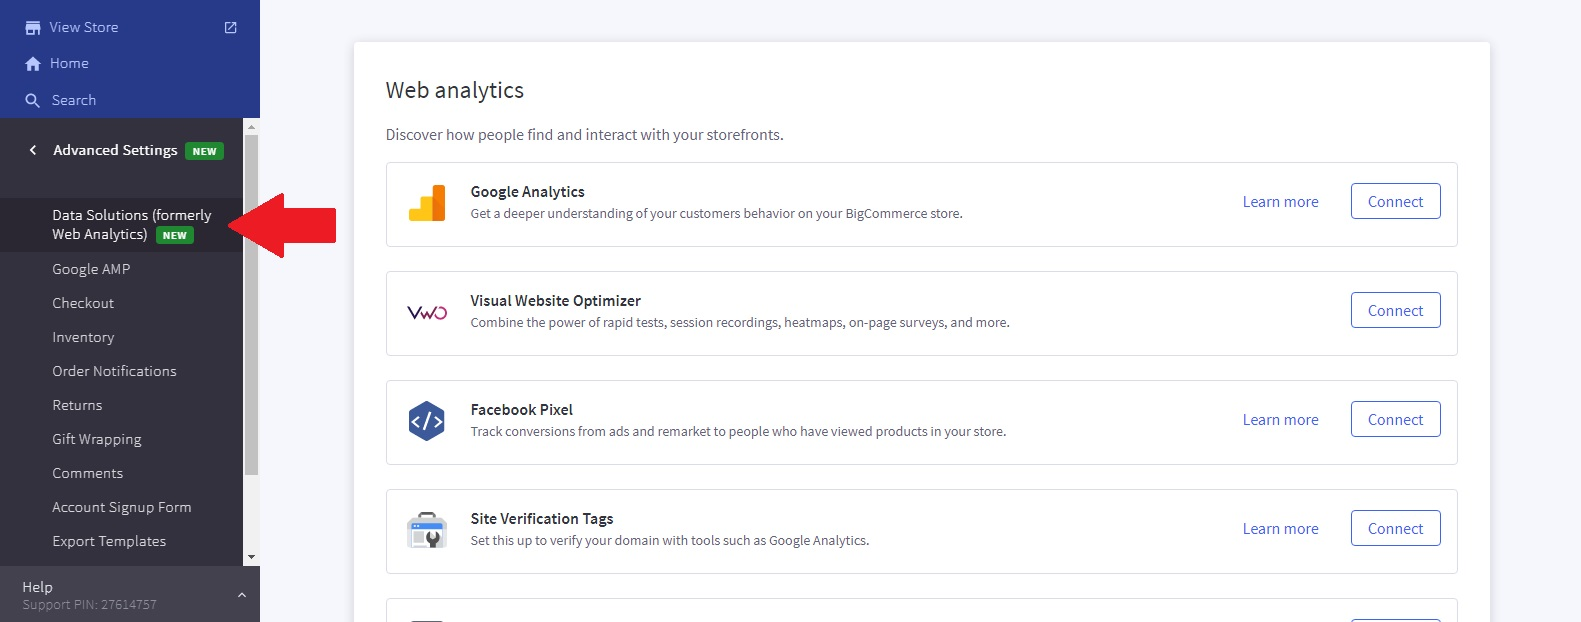 BigCommerce Web Analytics page